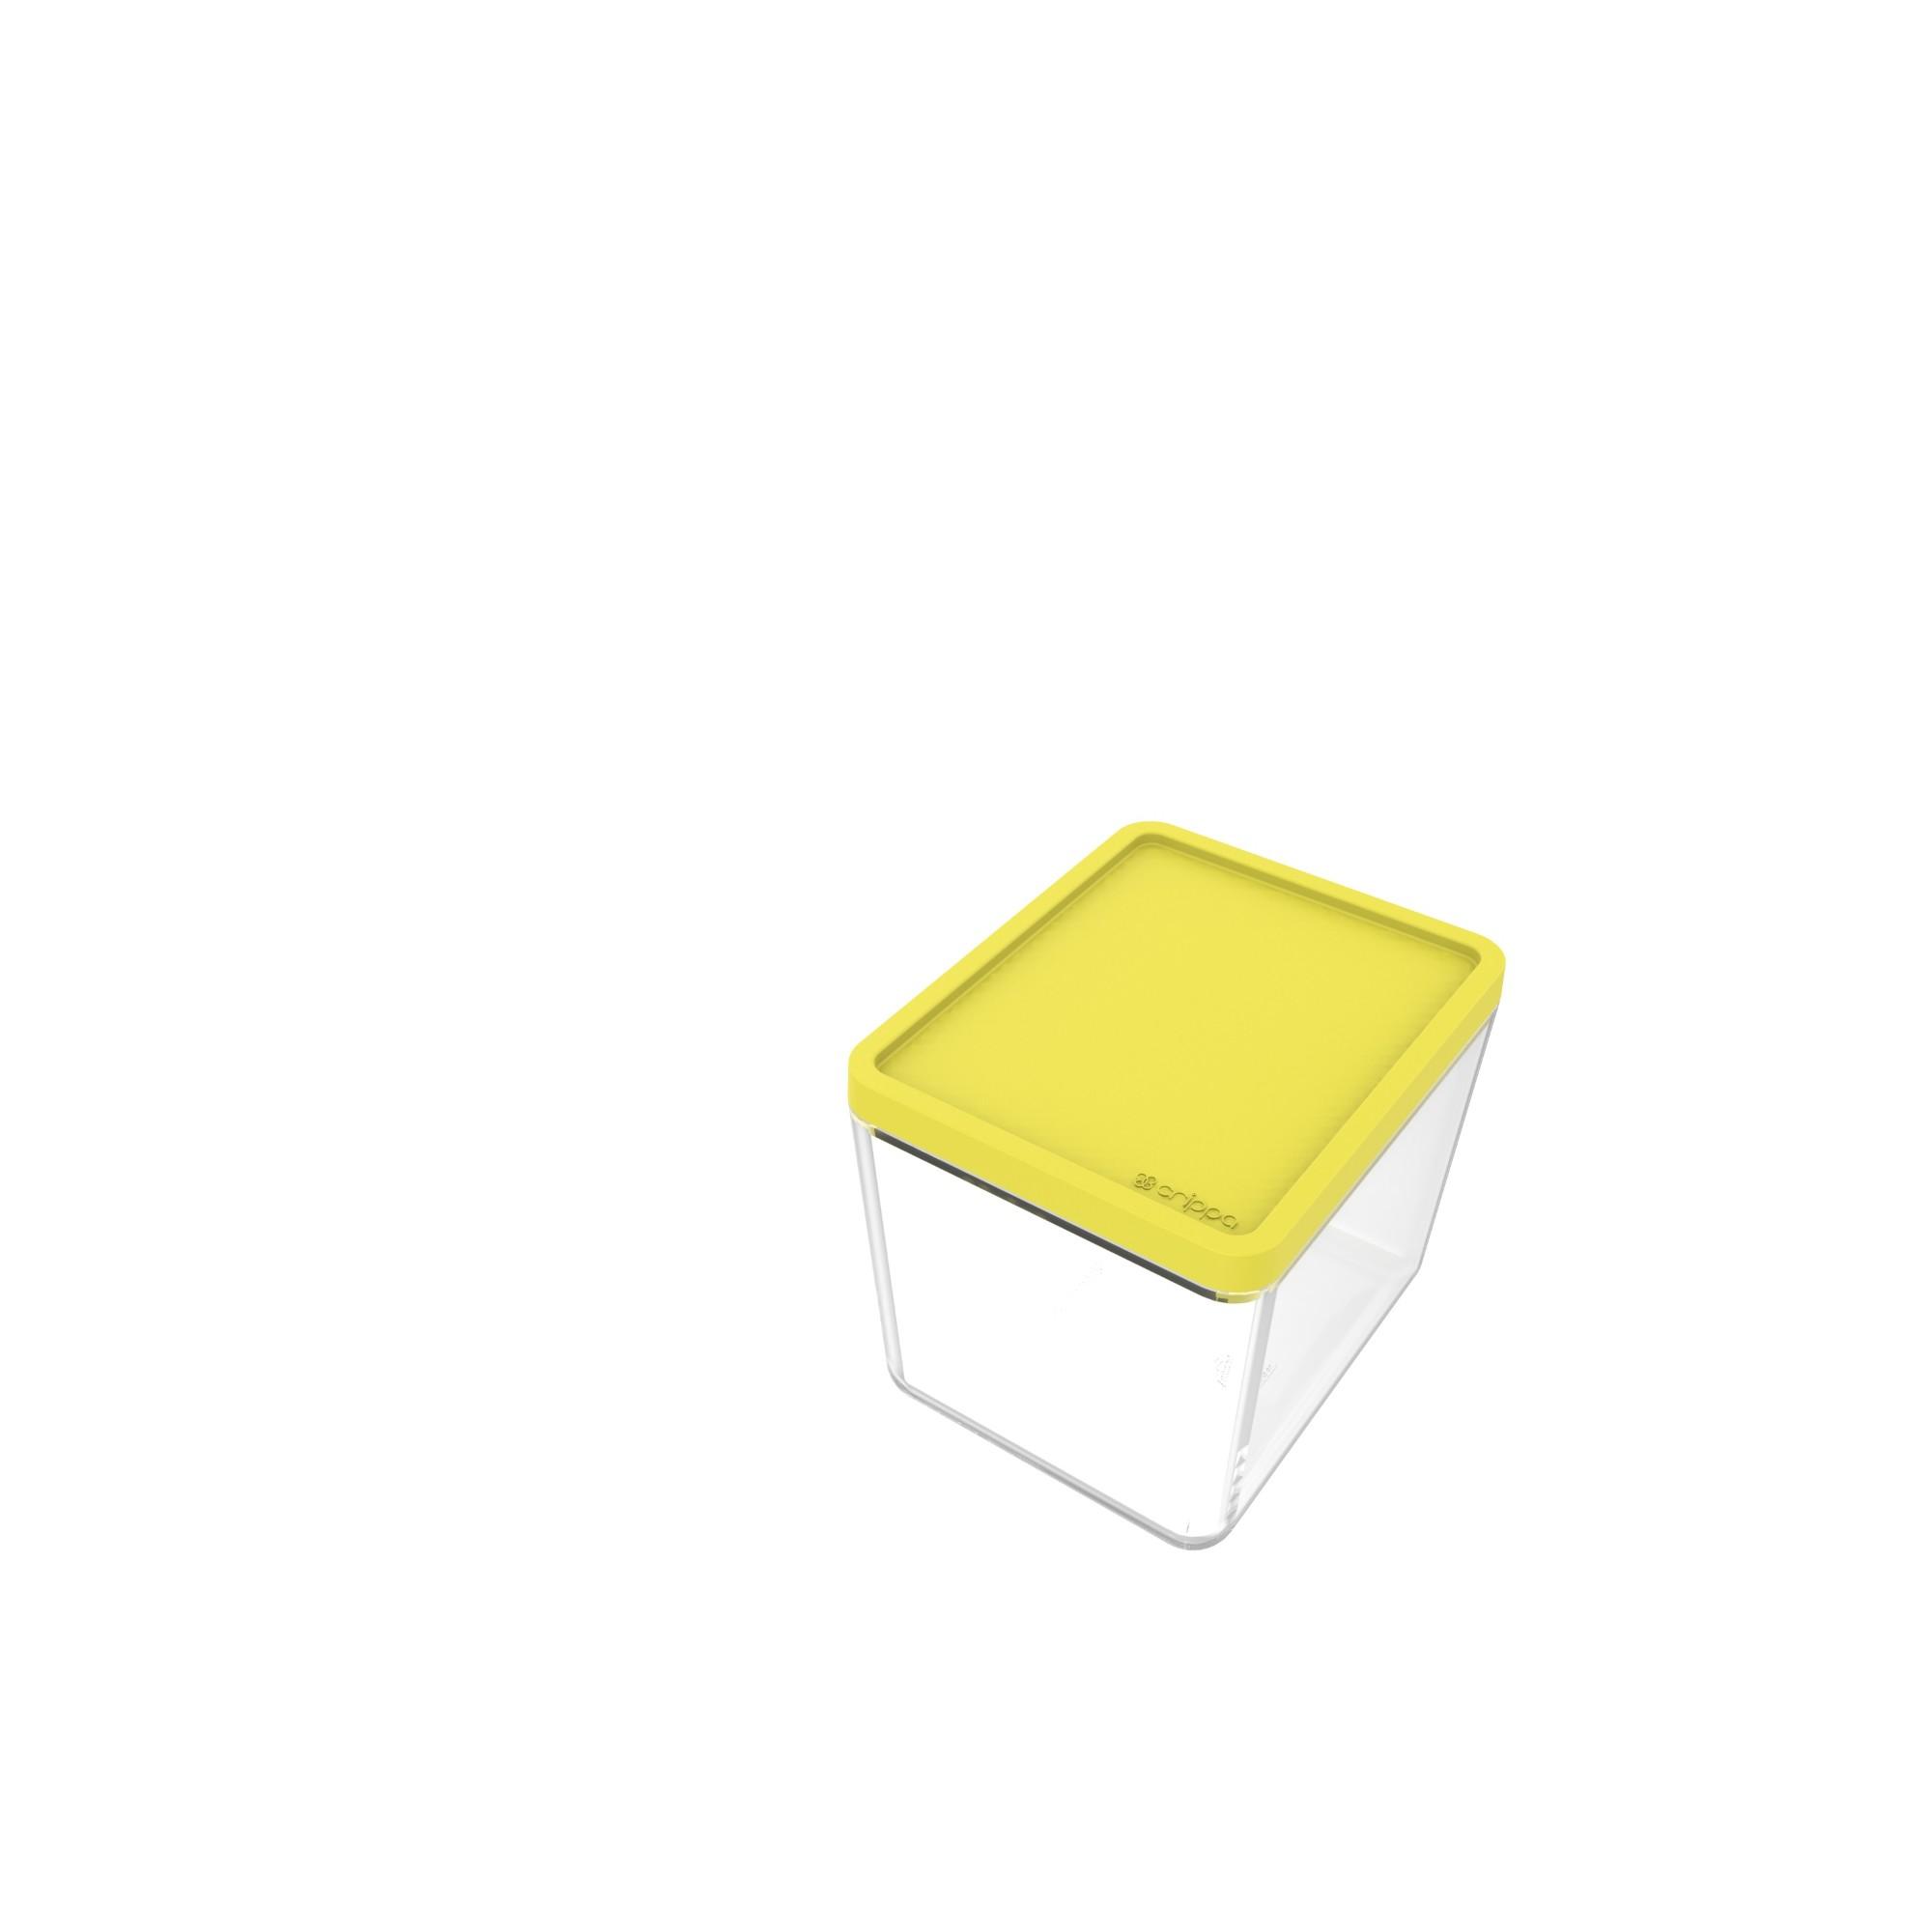 Pote Plastico Hermetico Retangular 350ml Amarelo - Crippa